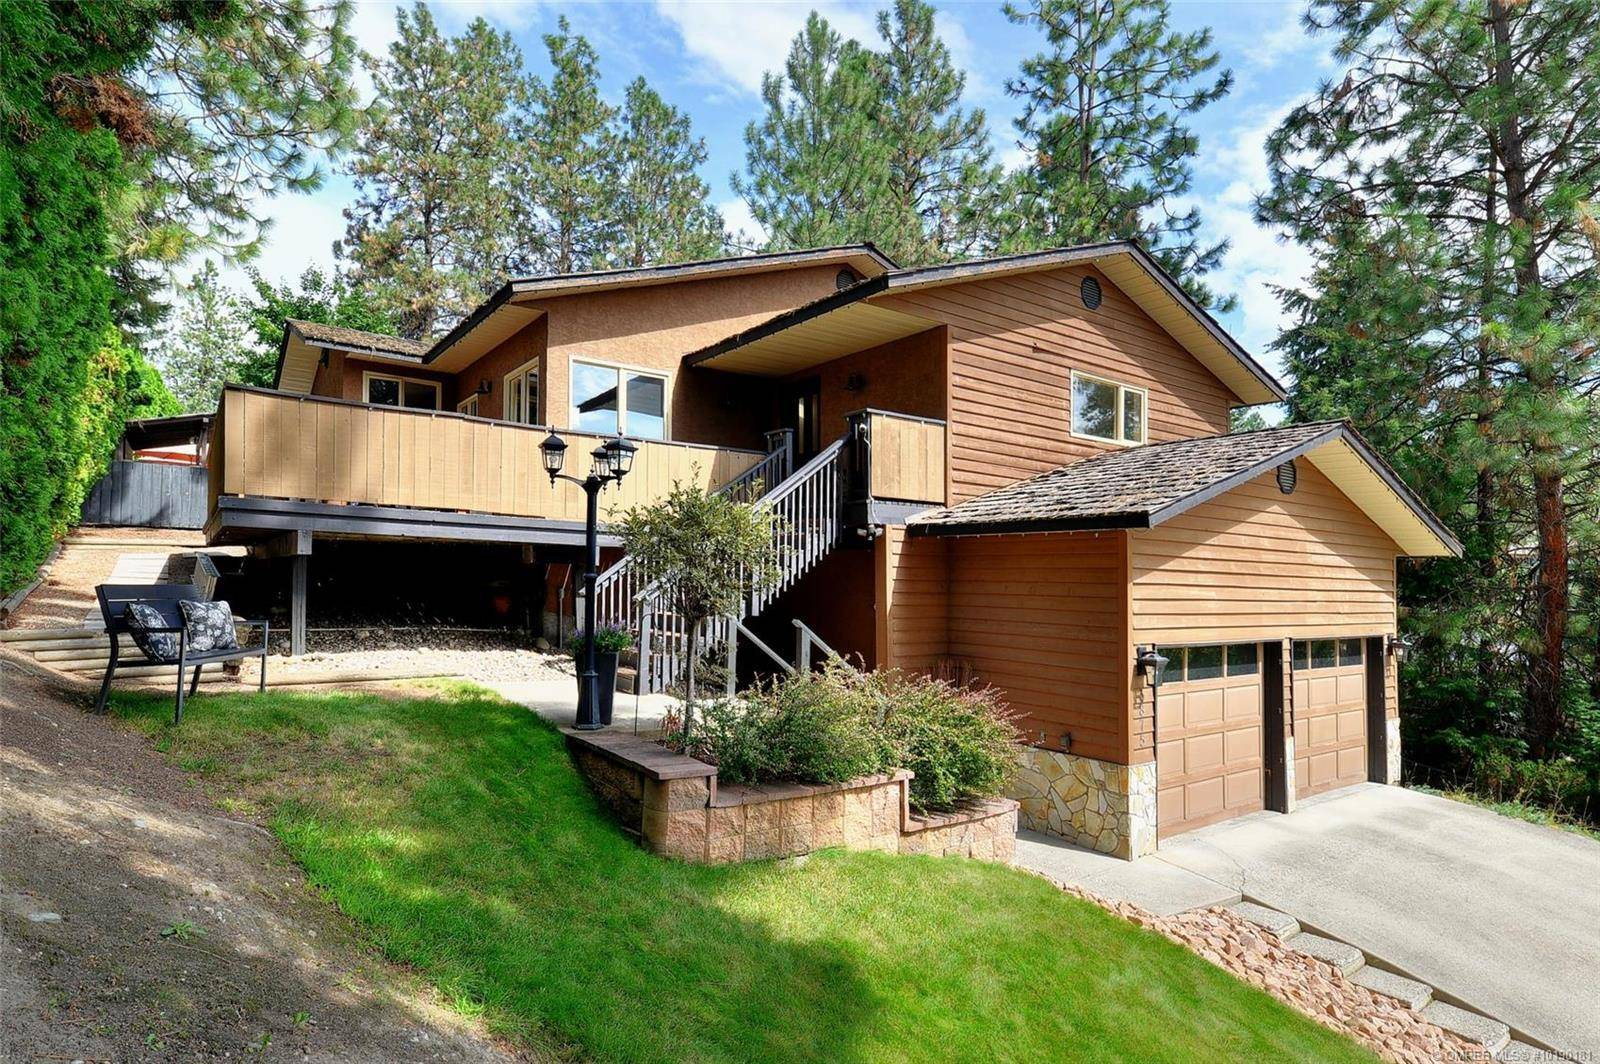 House for sale at 3875 Tillicum Ct Kelowna British Columbia - MLS: 10190181